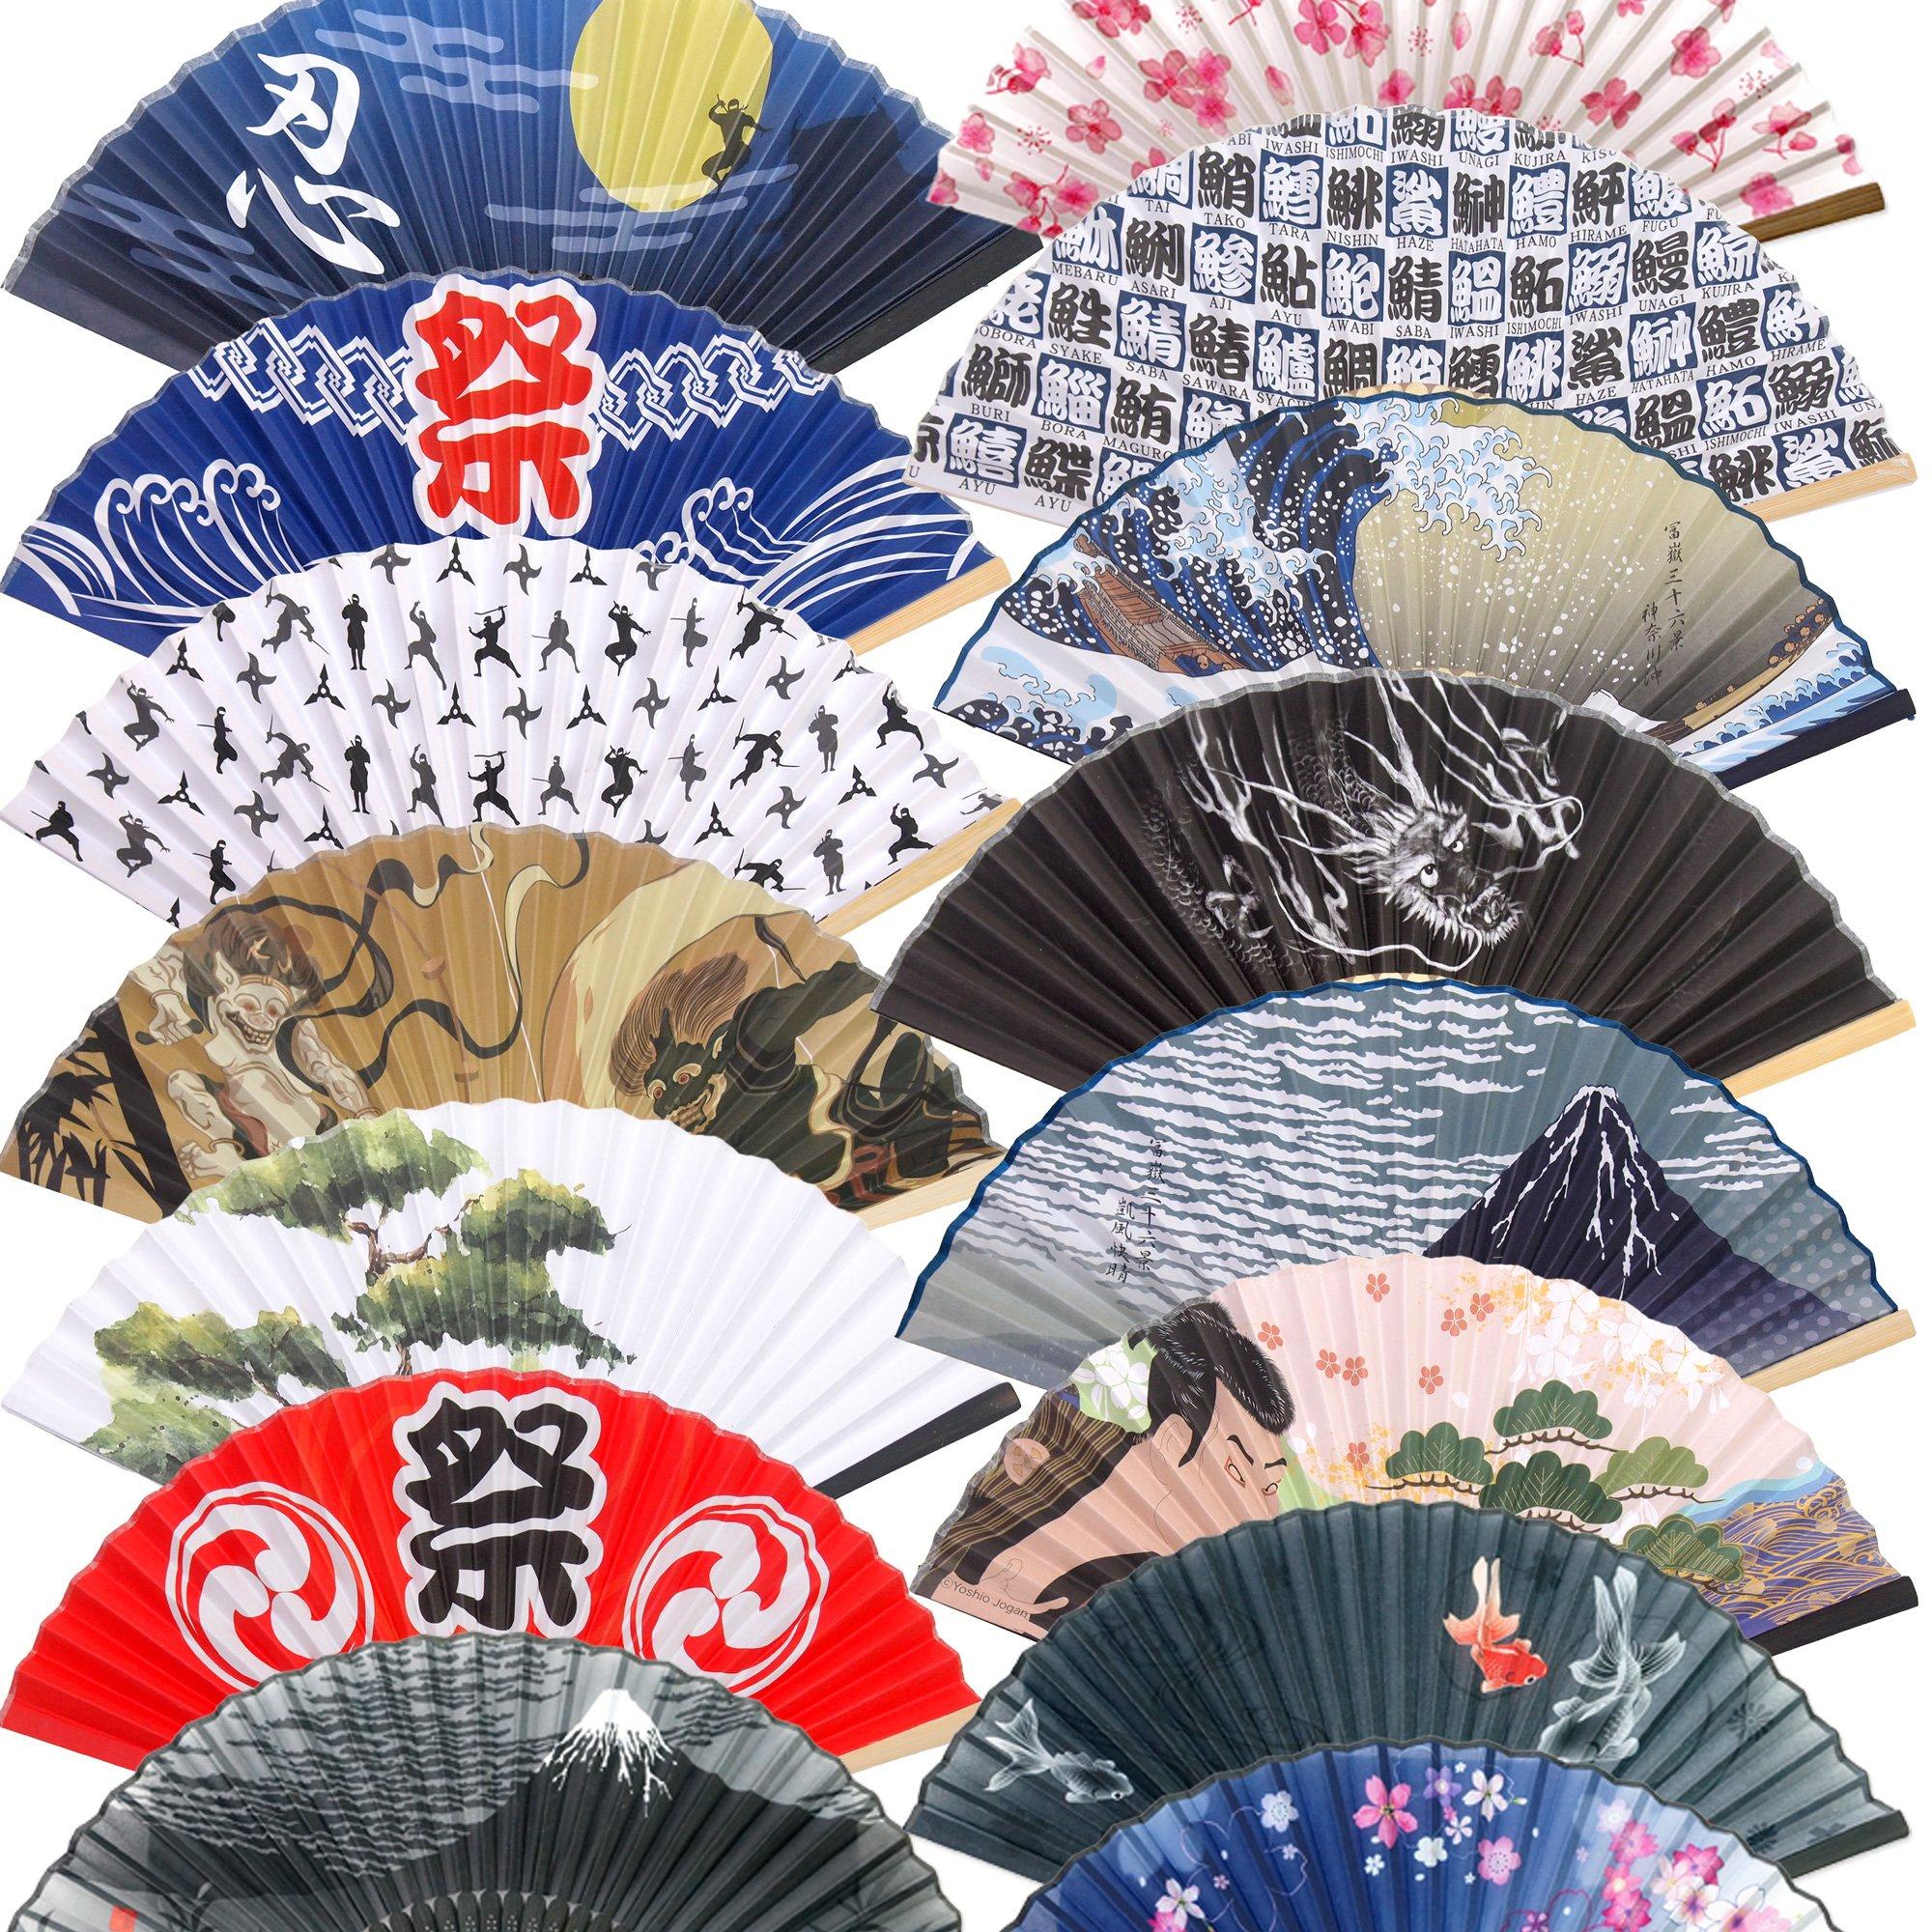 Folding Fans 5pcs set Japanese Traditional style Vintage Retro Style Hand Fan Random assort set by JAPANESE cool items store